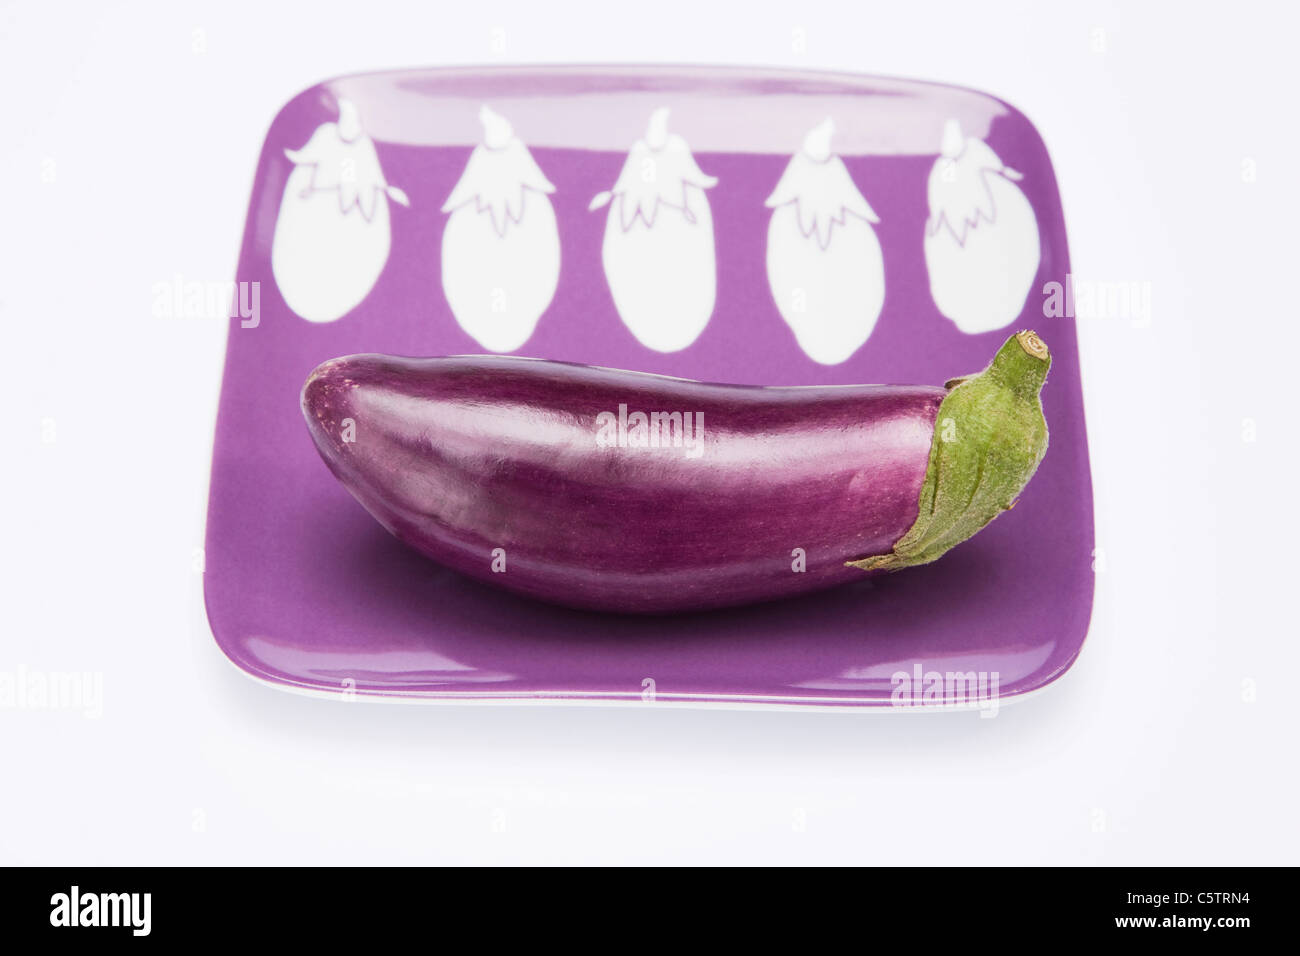 Raw Eggplant (Solanum melongena) on plate Stock Photo